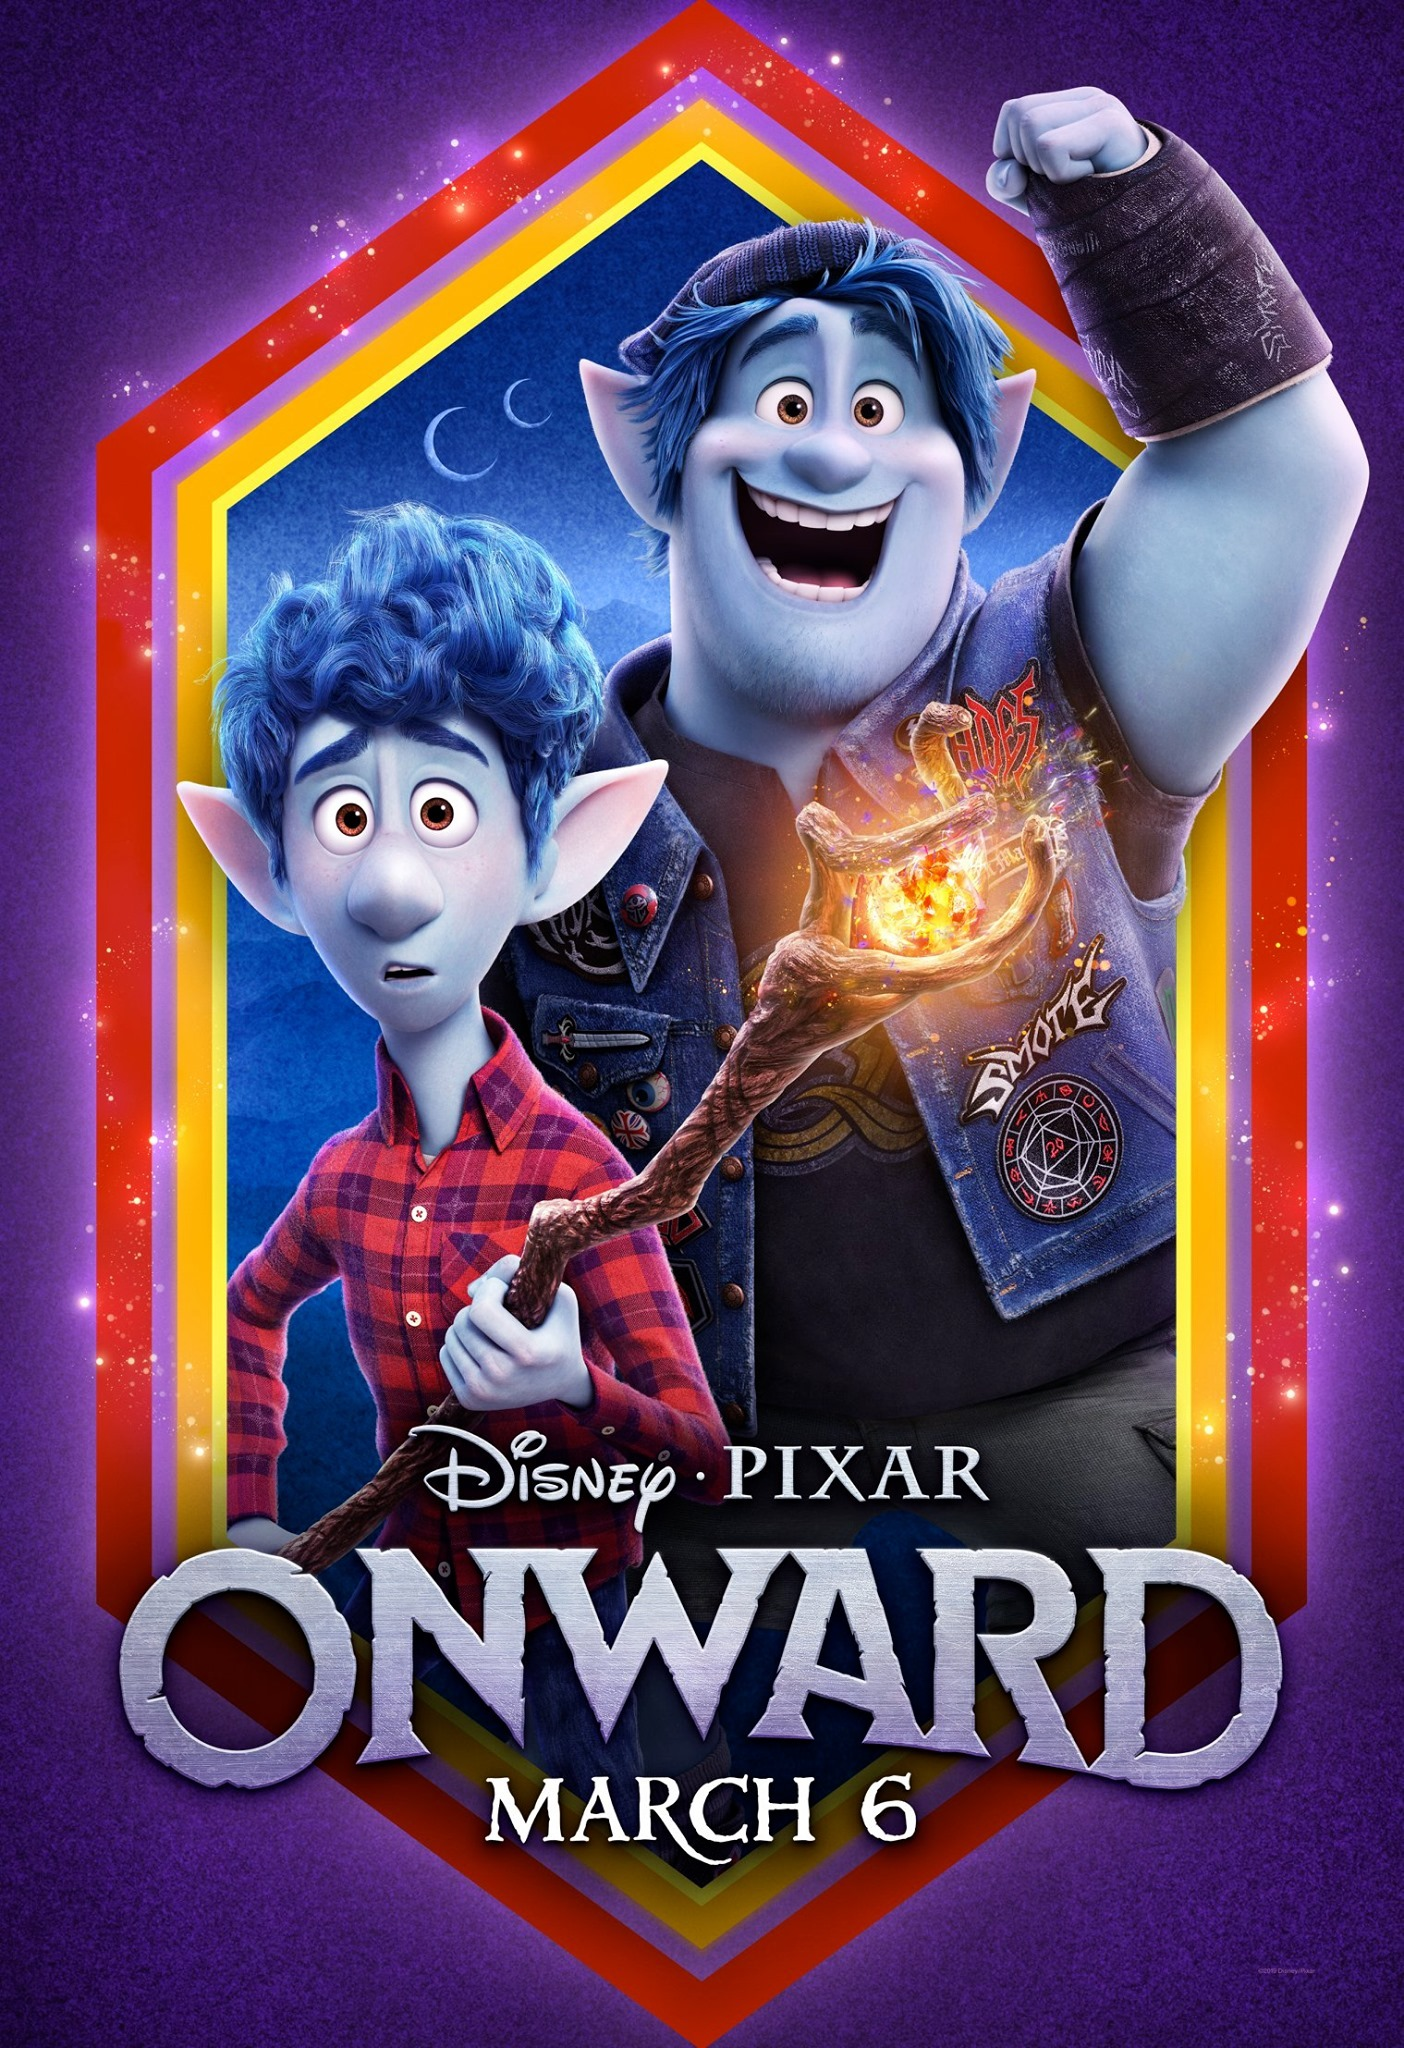 szmk_onward_elore_pixar_disney_animaacos_film_9.jpg